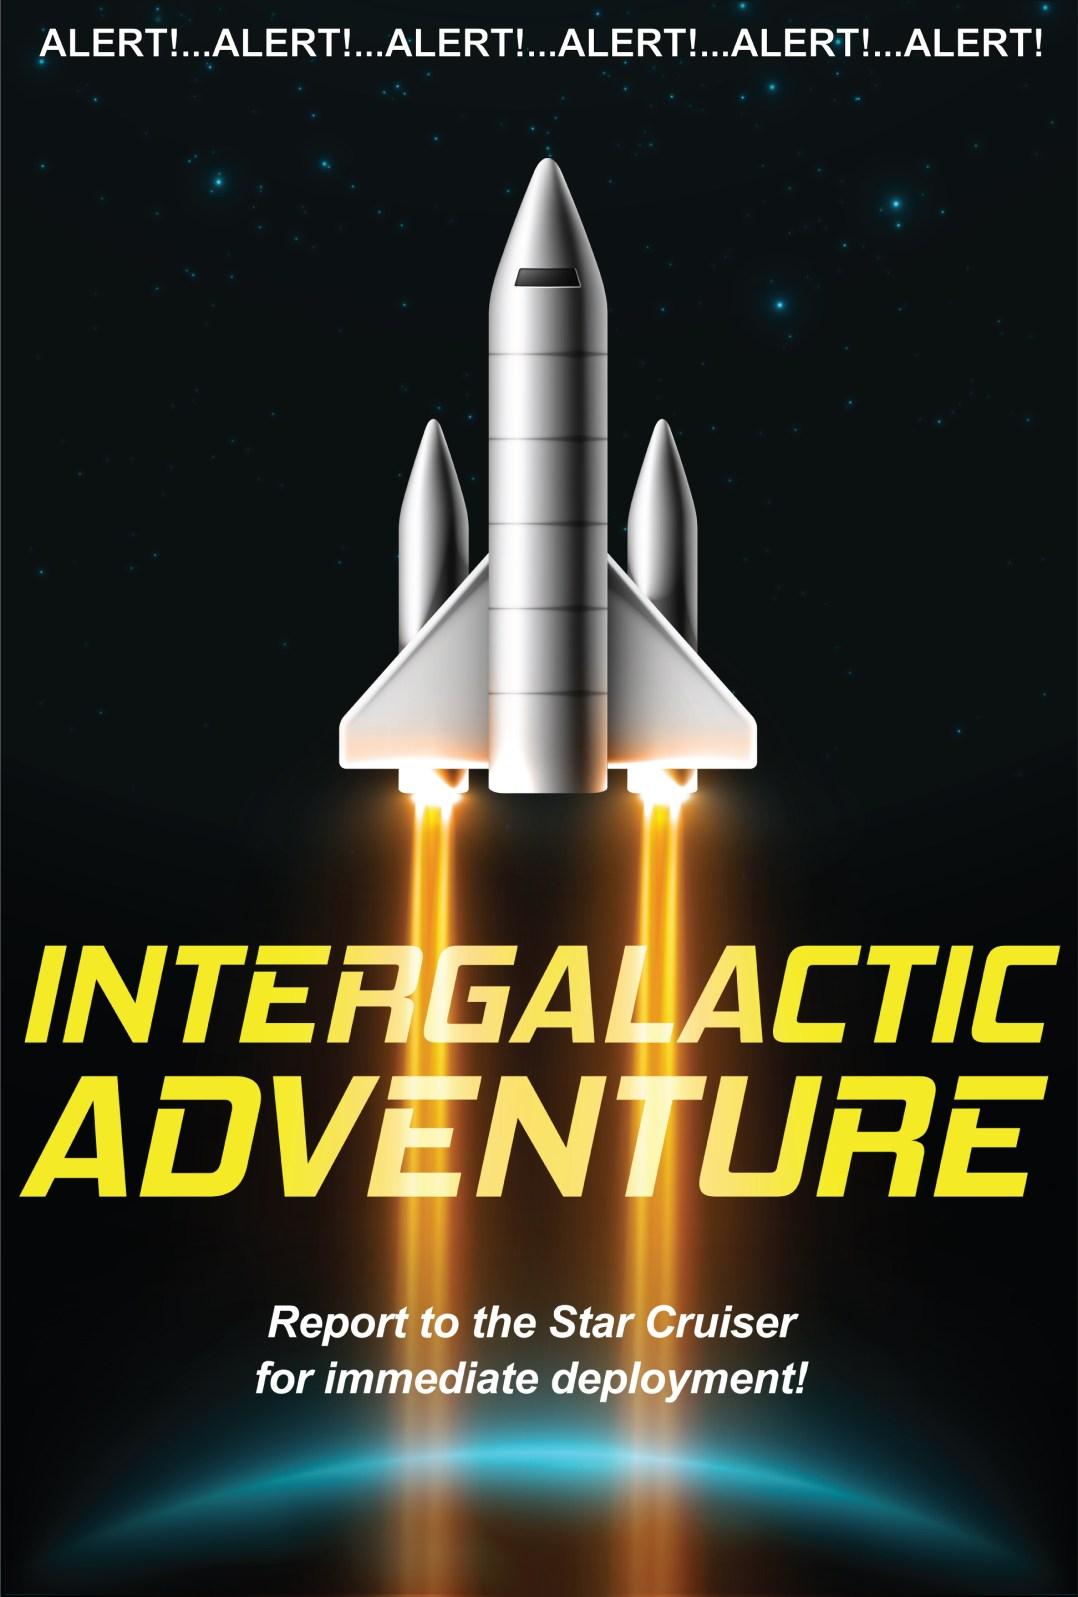 TBP-Program-Poster_0010_Intergalactic-Adventure